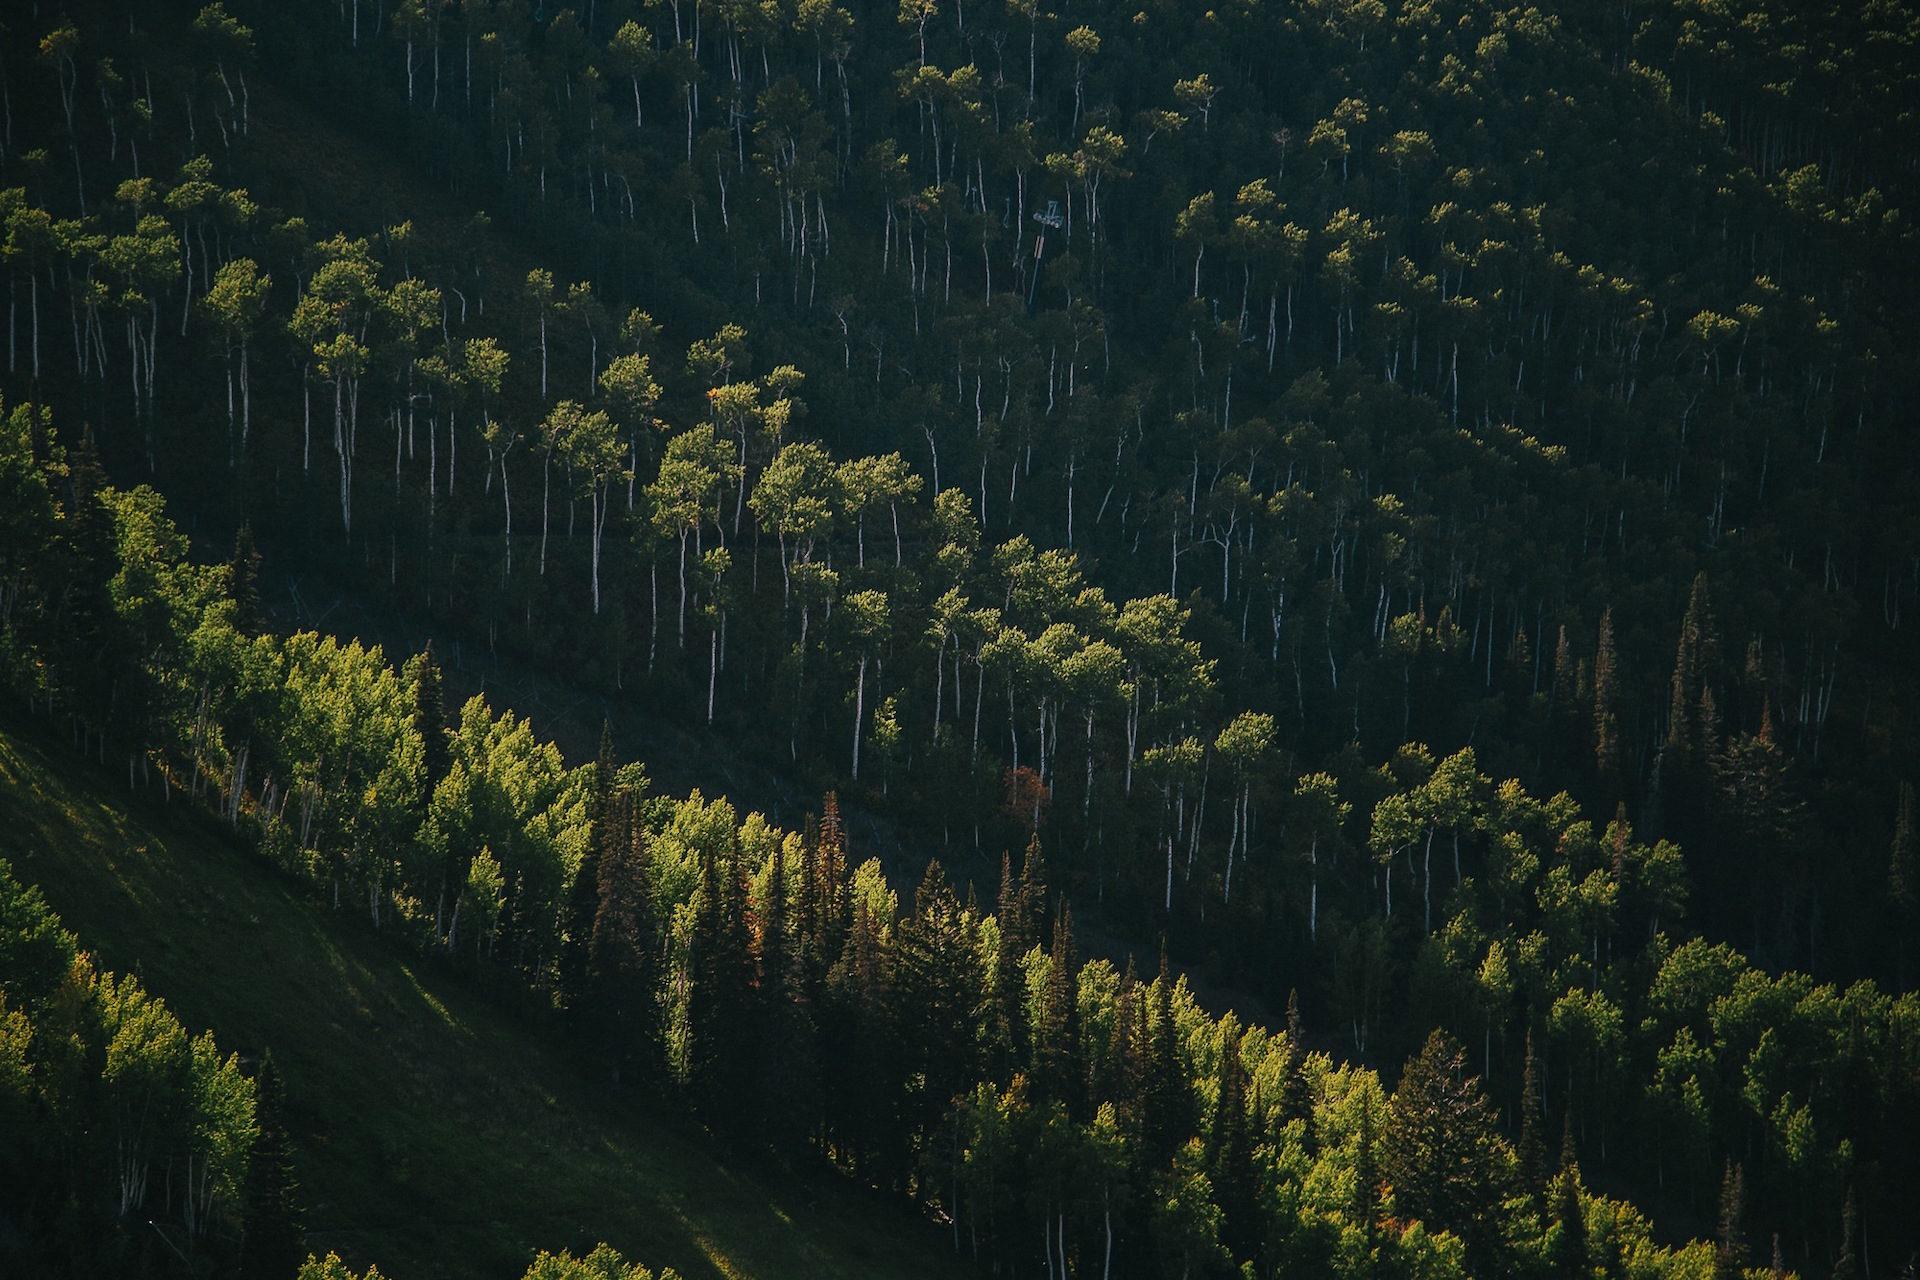 bosque, árboles, maleza, ecosistema, verde - Fondos de Pantalla HD - professor-falken.com